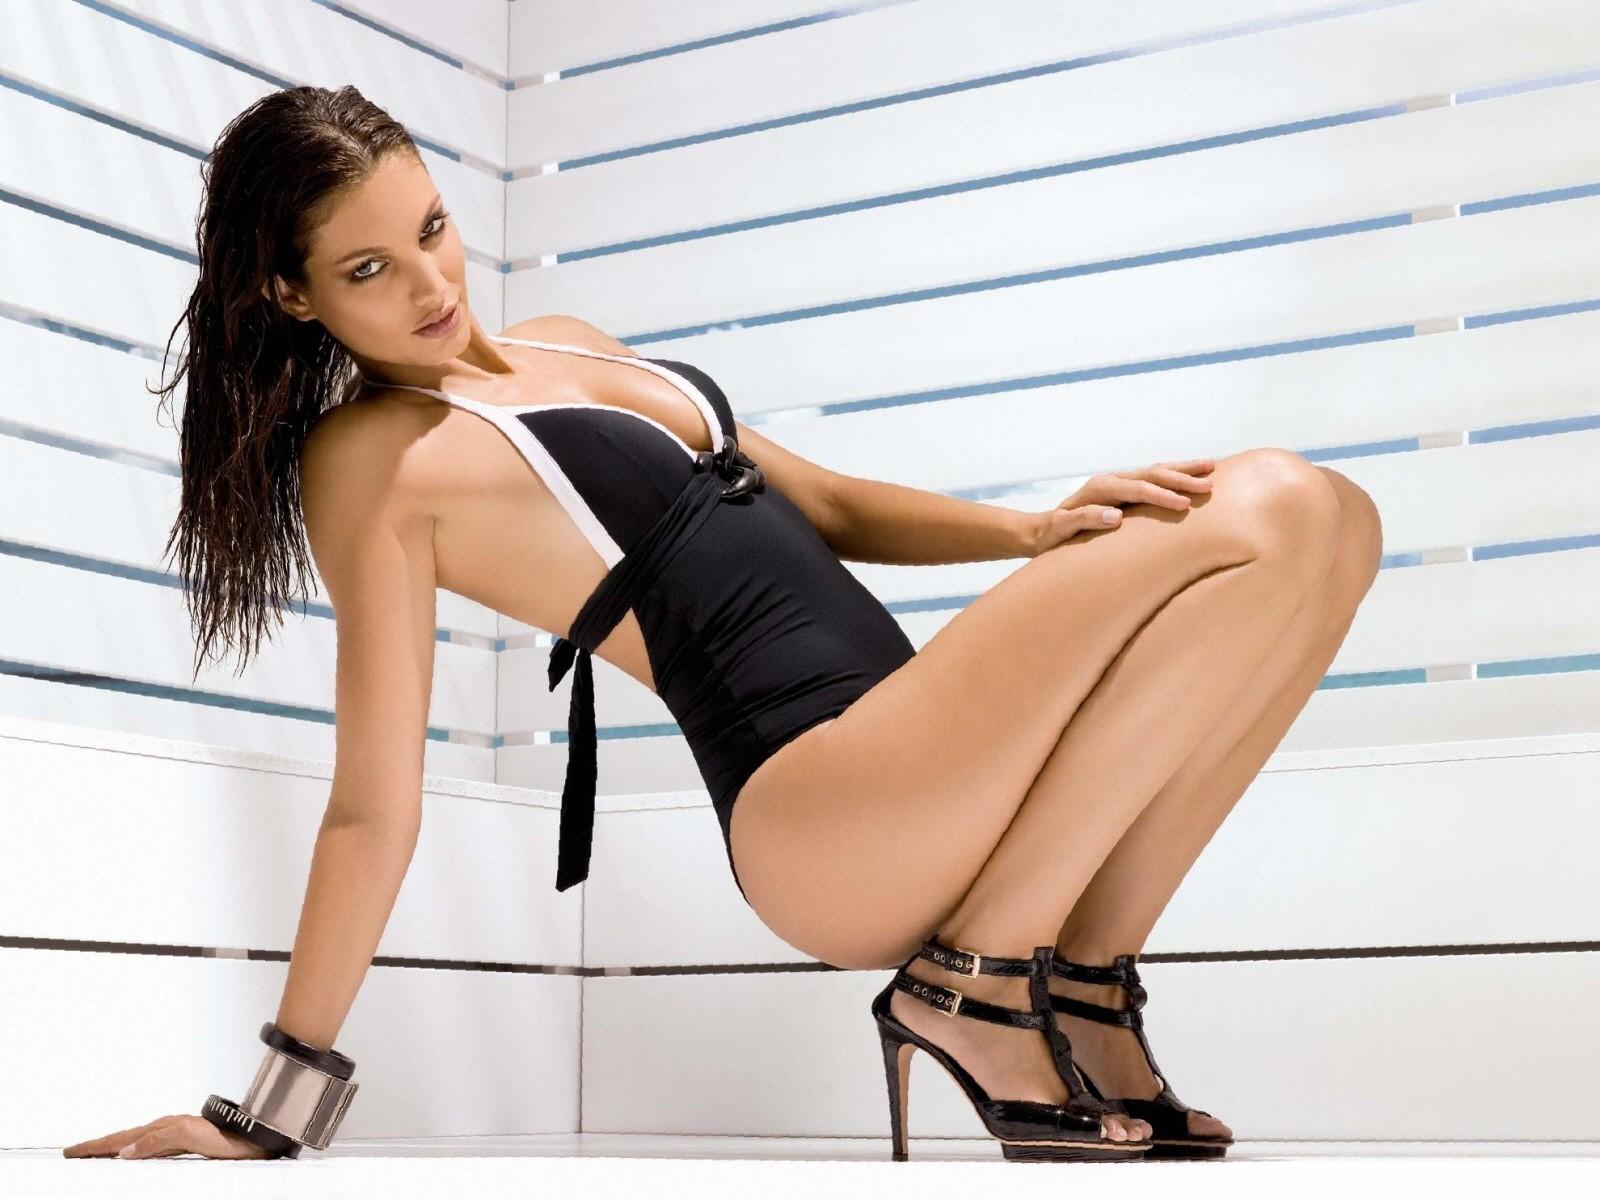 Naga buty girl photo porn movie